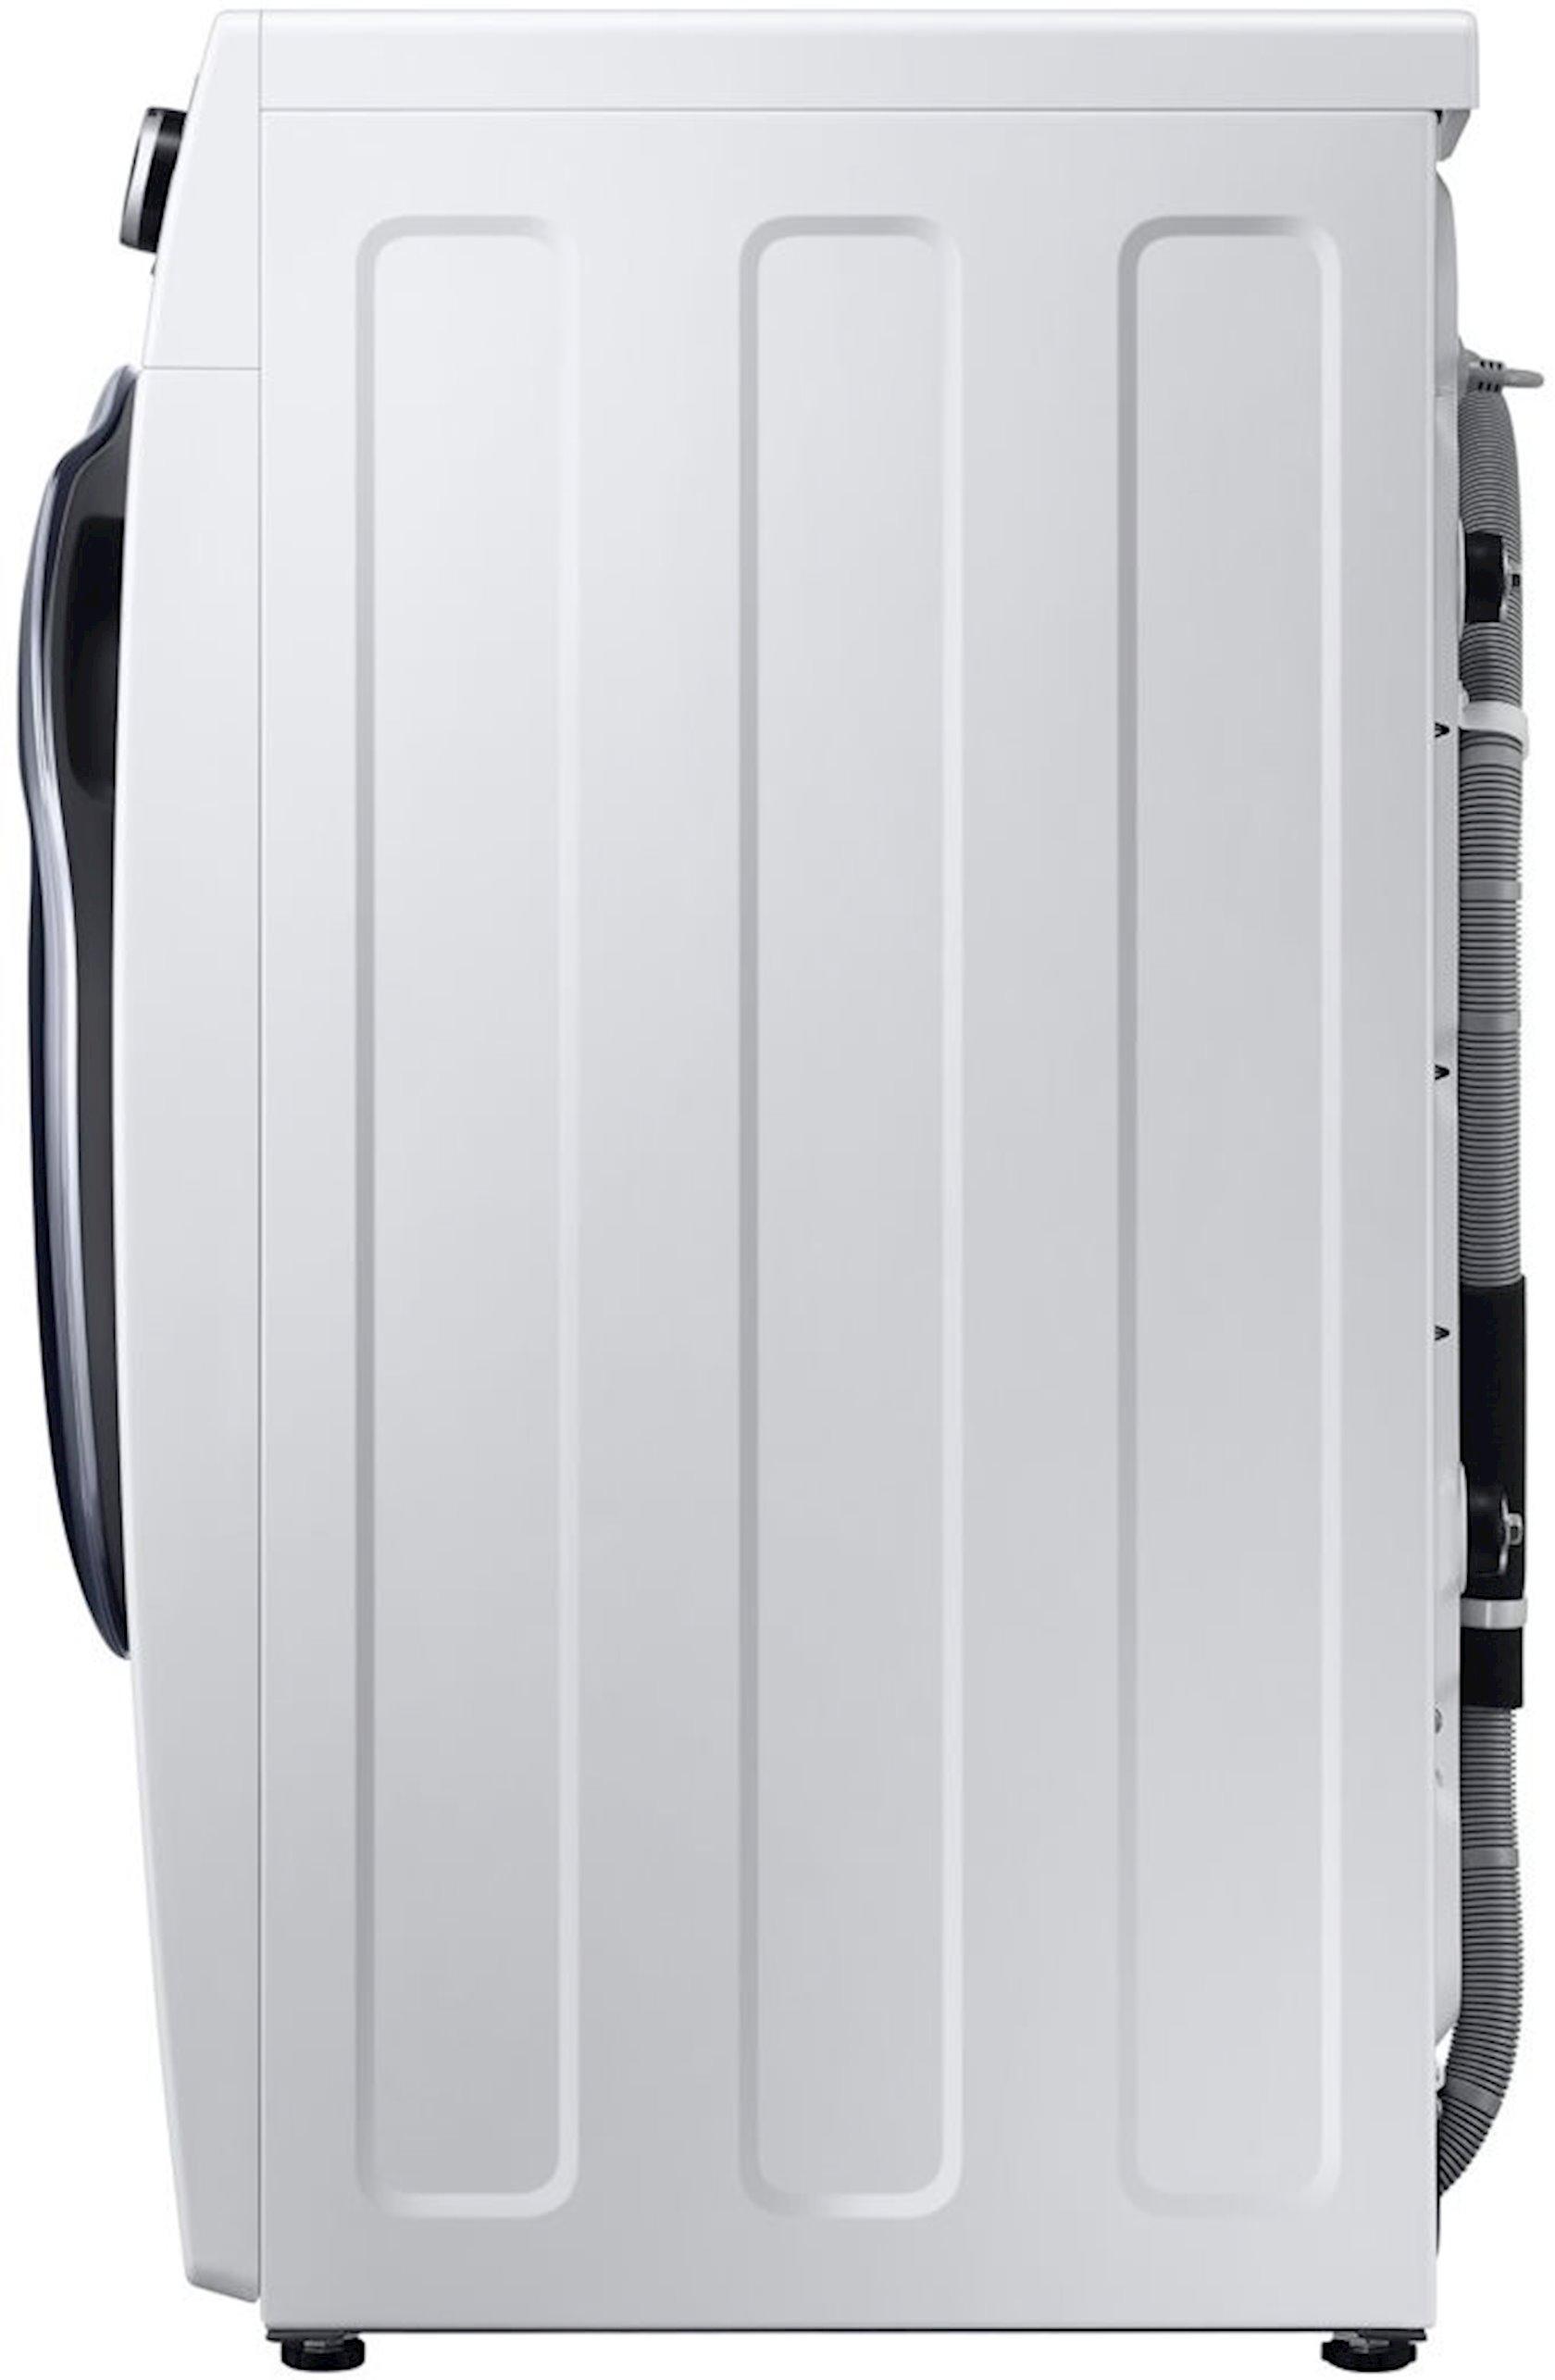 Paltaryuyan maşın Samsung 8kq WD80K52E0ZWLP